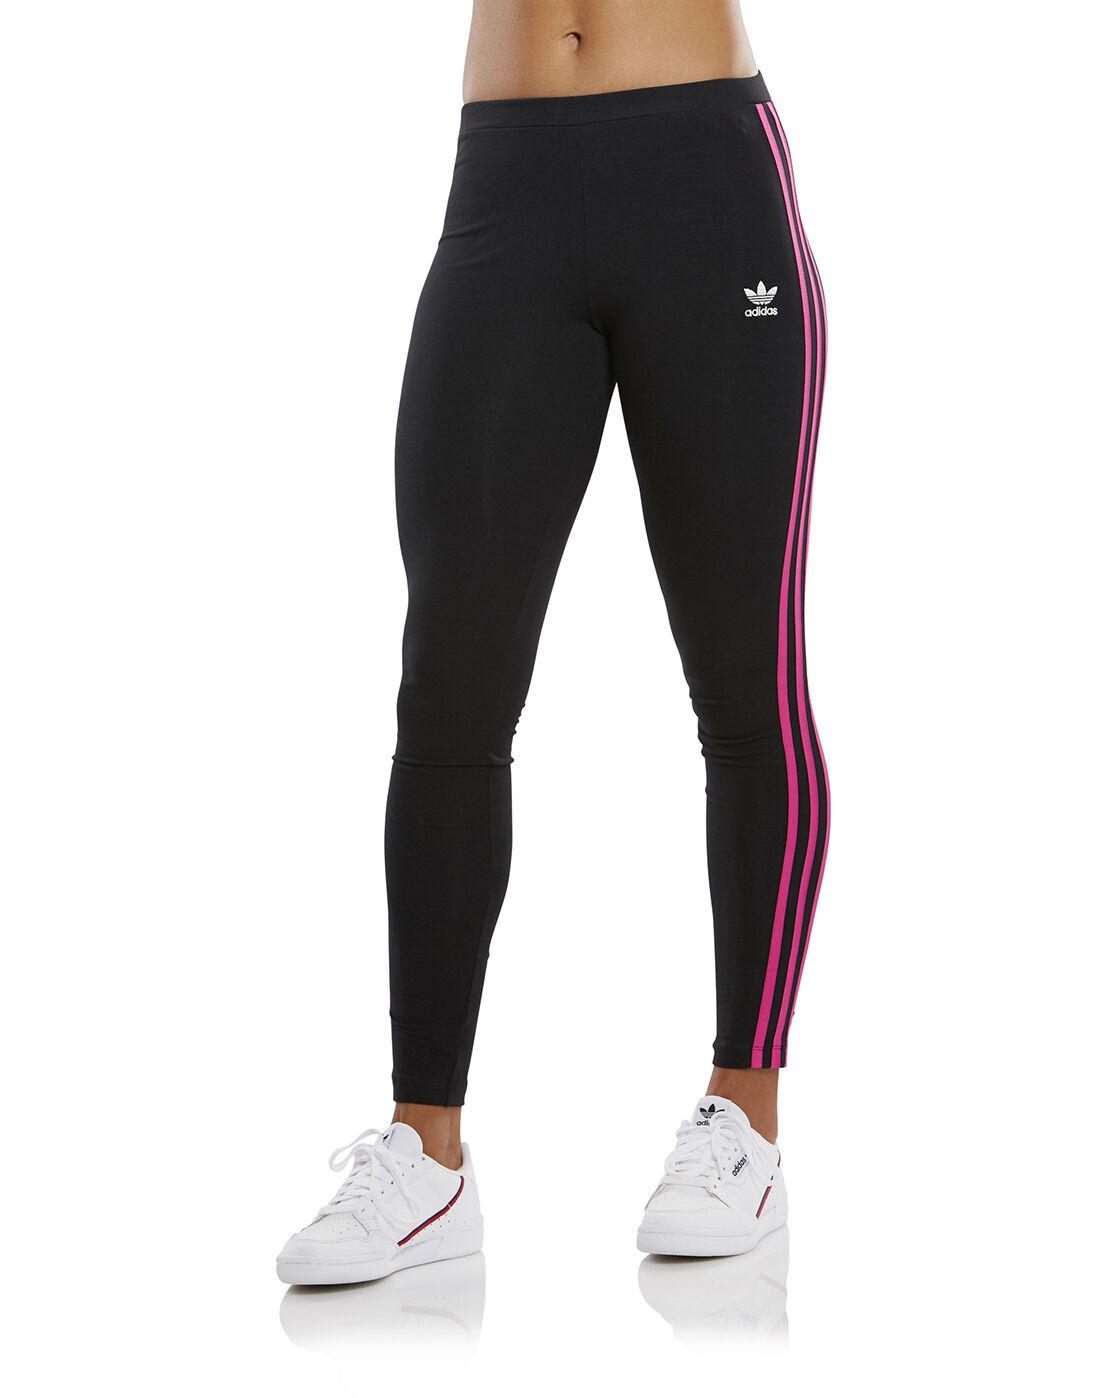 Women's Black & Pink adidas Originals Leggings | Life Style